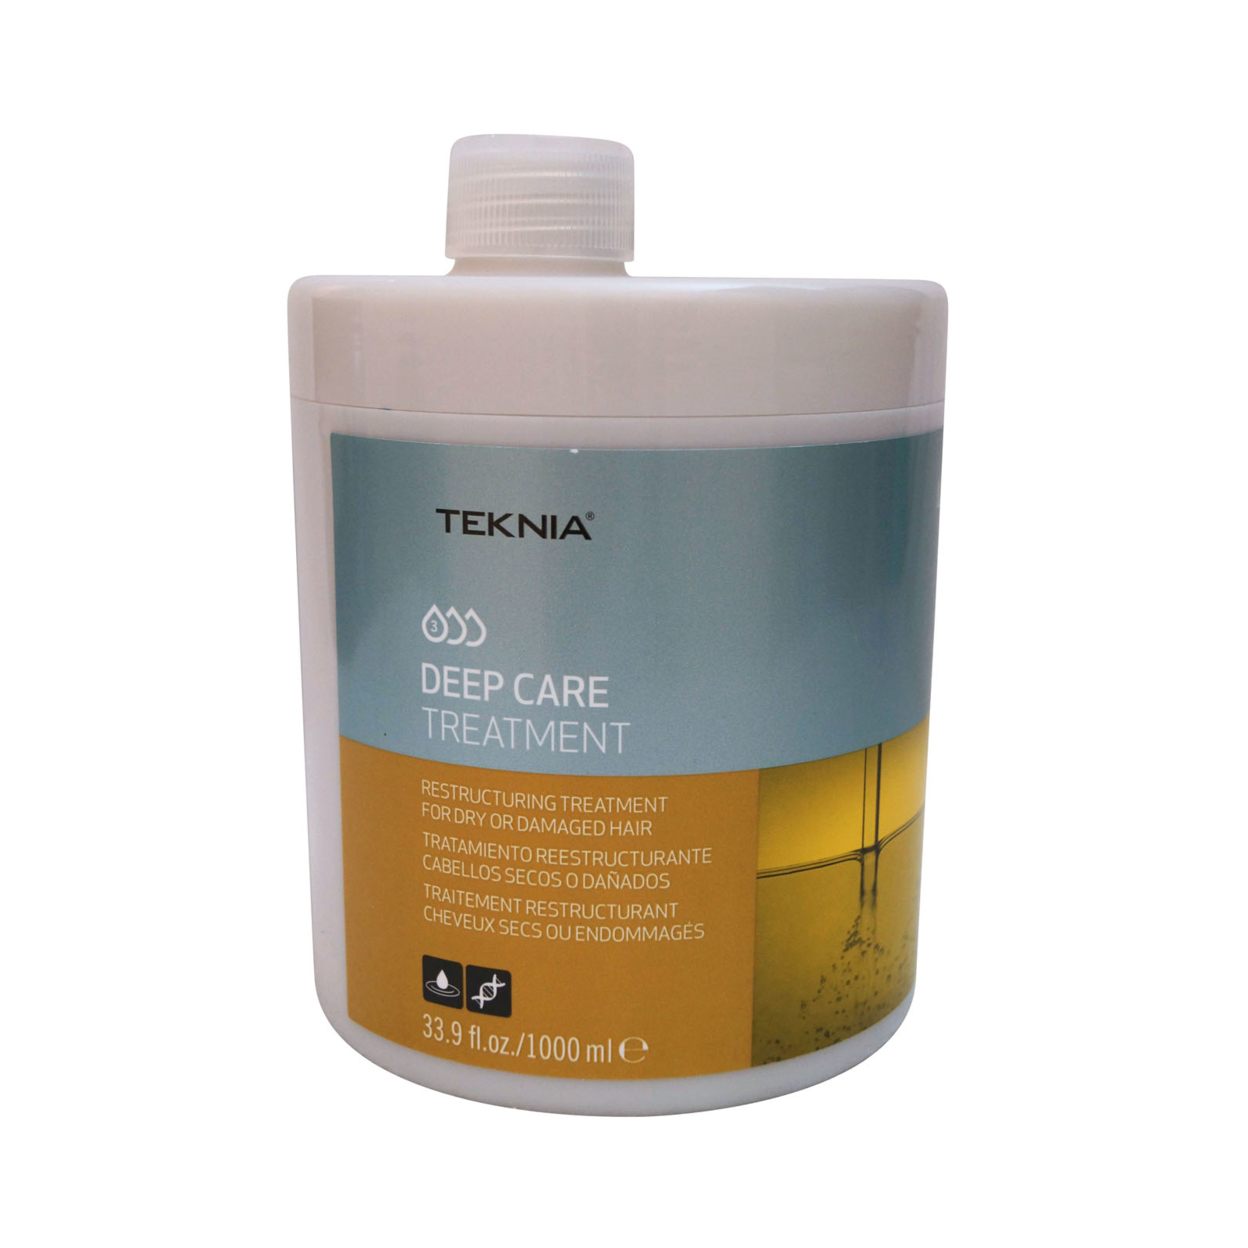 Lakme Teknia Deep Care Treatment 33.9 oz 1000 ml маска lakme deep care restructuring treatment